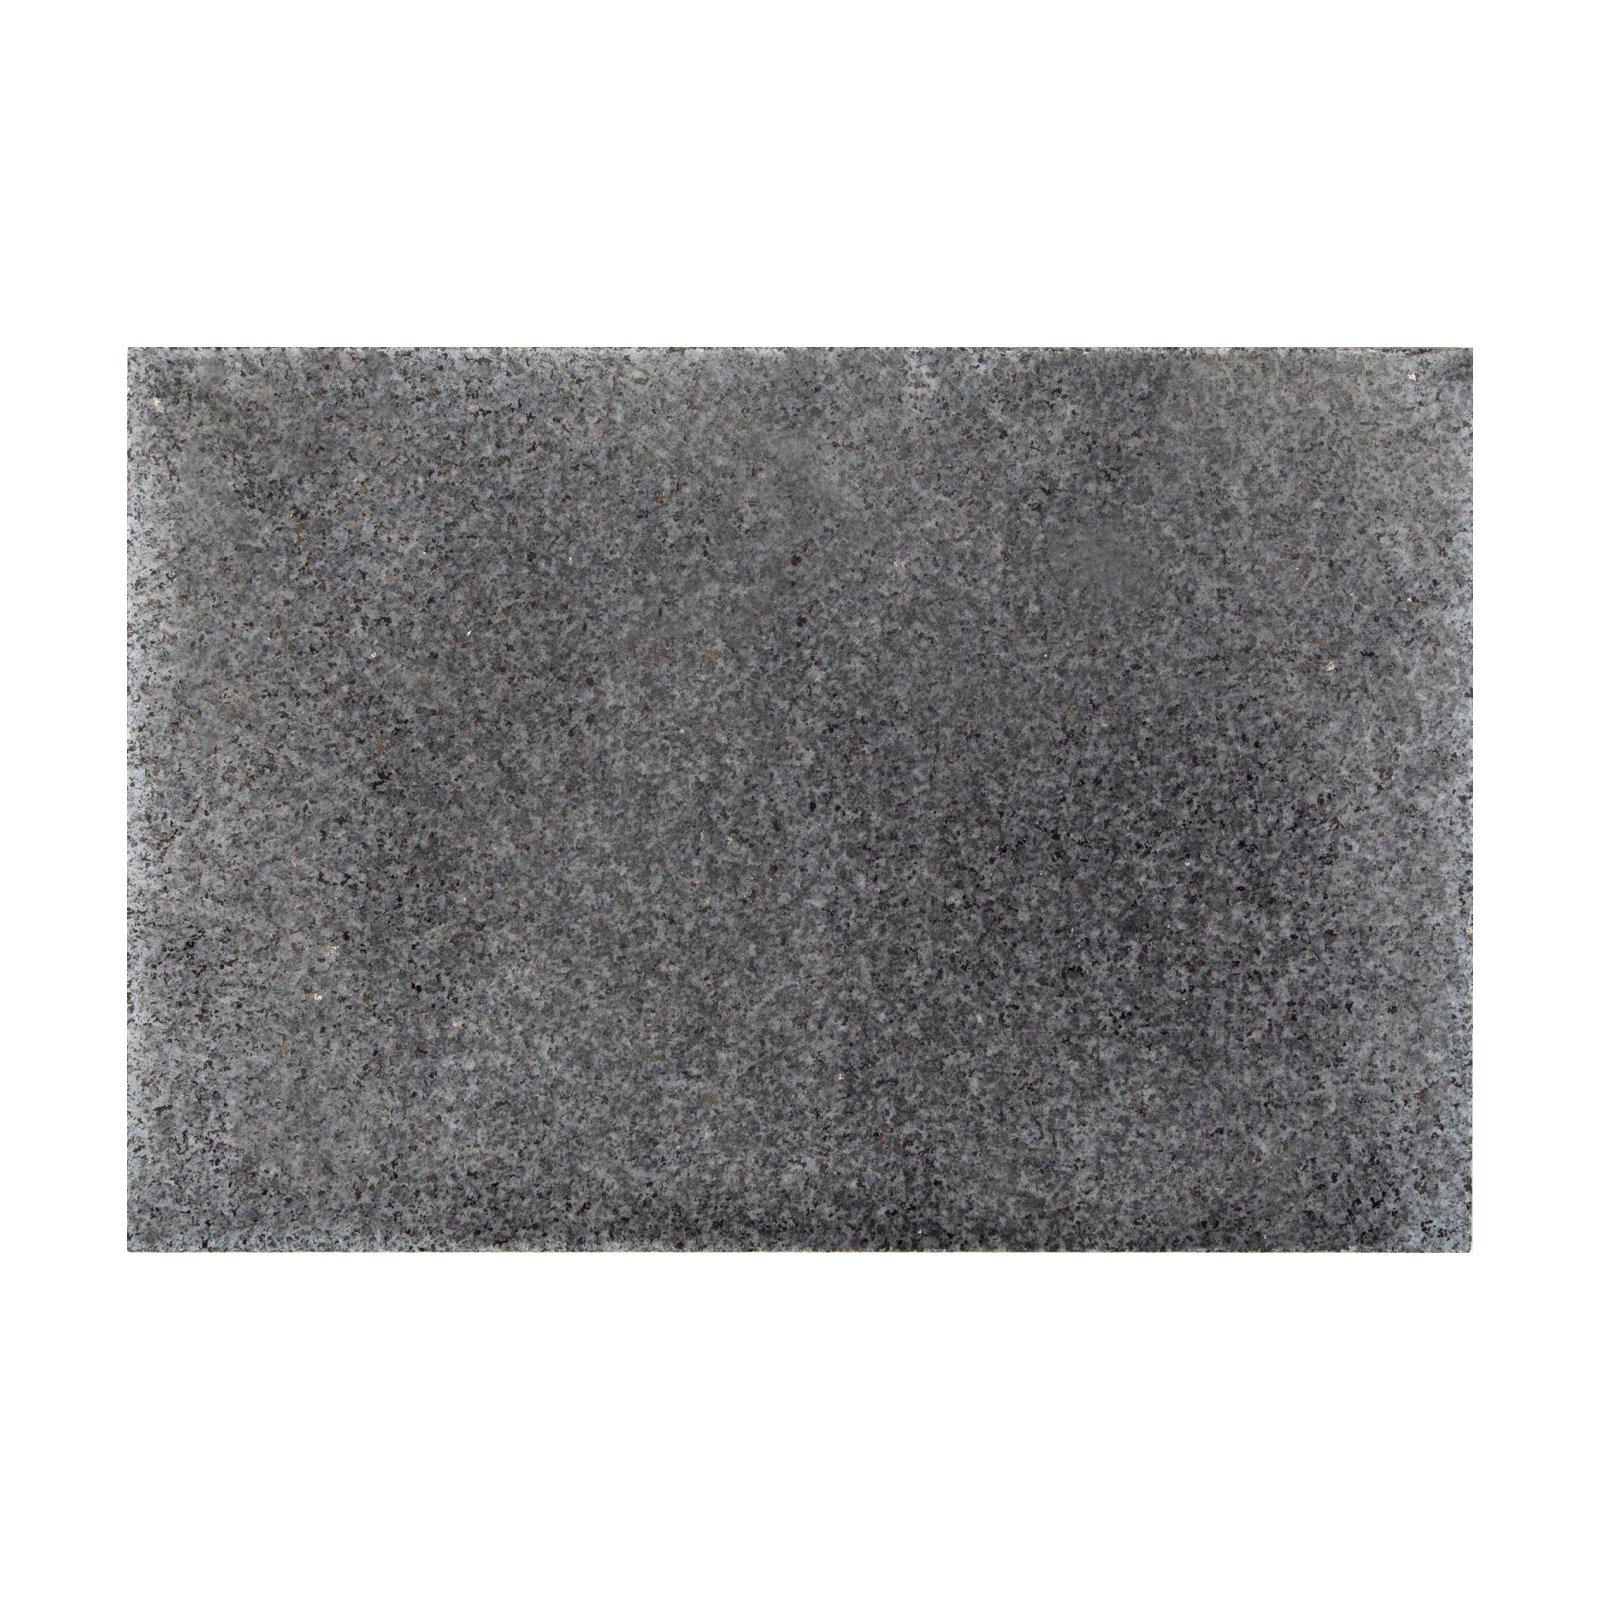 Tuscan Path 600 x 400 x 20mm Mid Grey Granite Paver